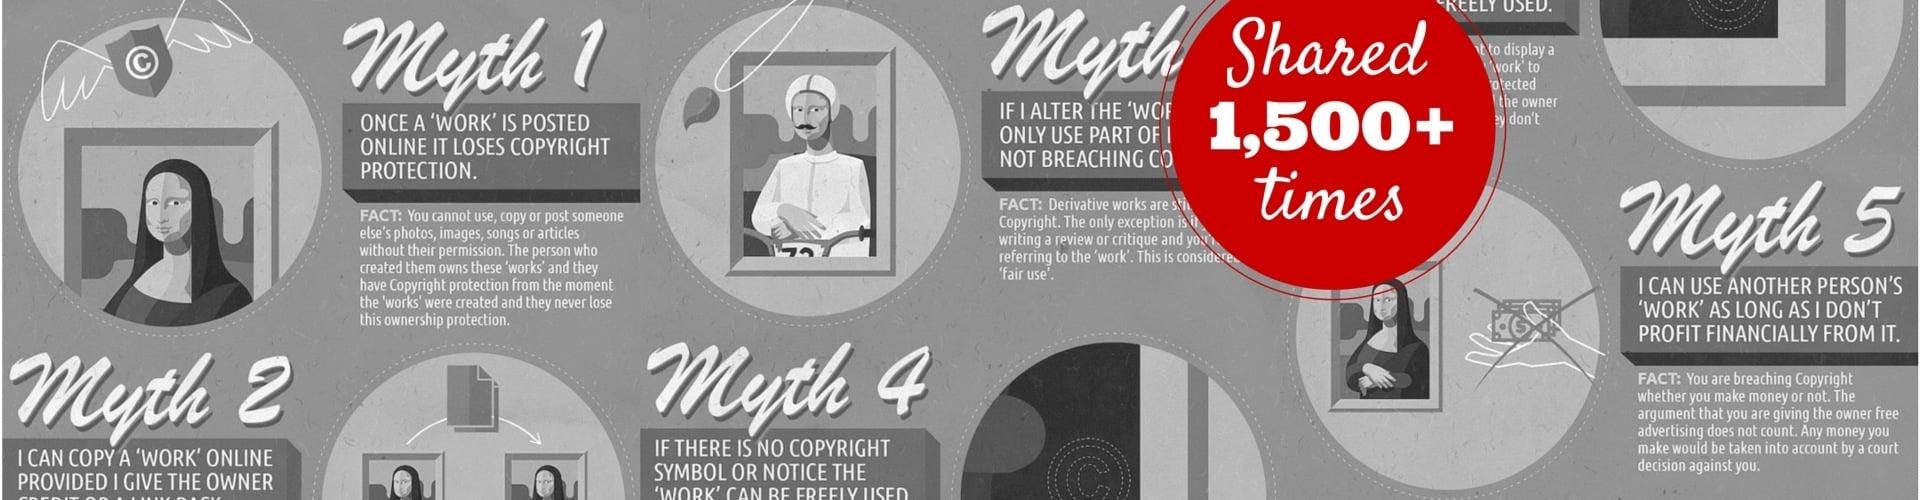 Copyright infringement 5 myths vs facts legal123 copyright infringement 5 myths vs facts infographic biocorpaavc